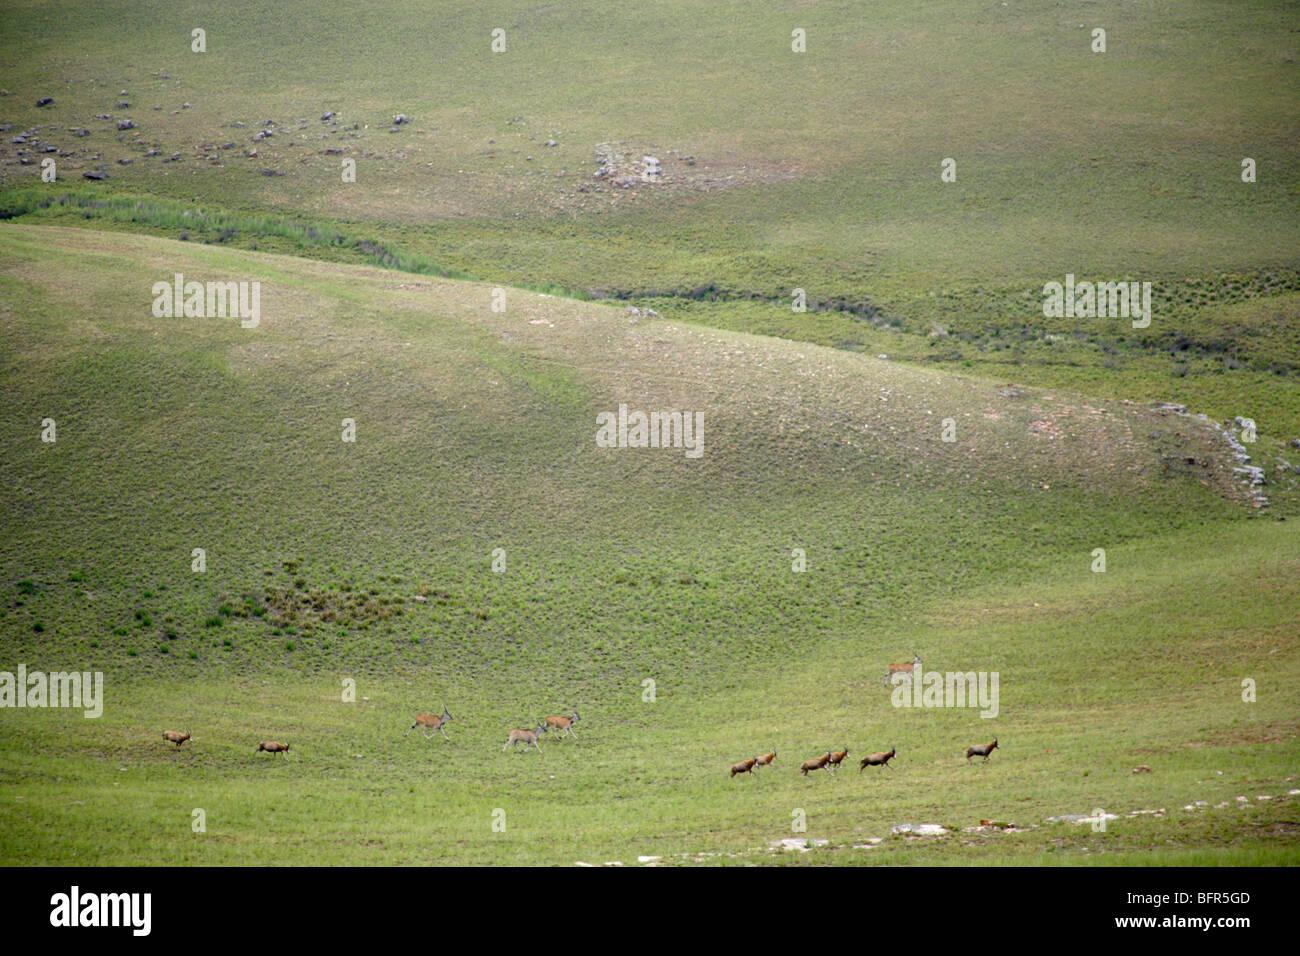 A herd of eland and blesbok on the grasslands of Hartebeestvlakte in the Transvaal Drakensberg - Stock Image